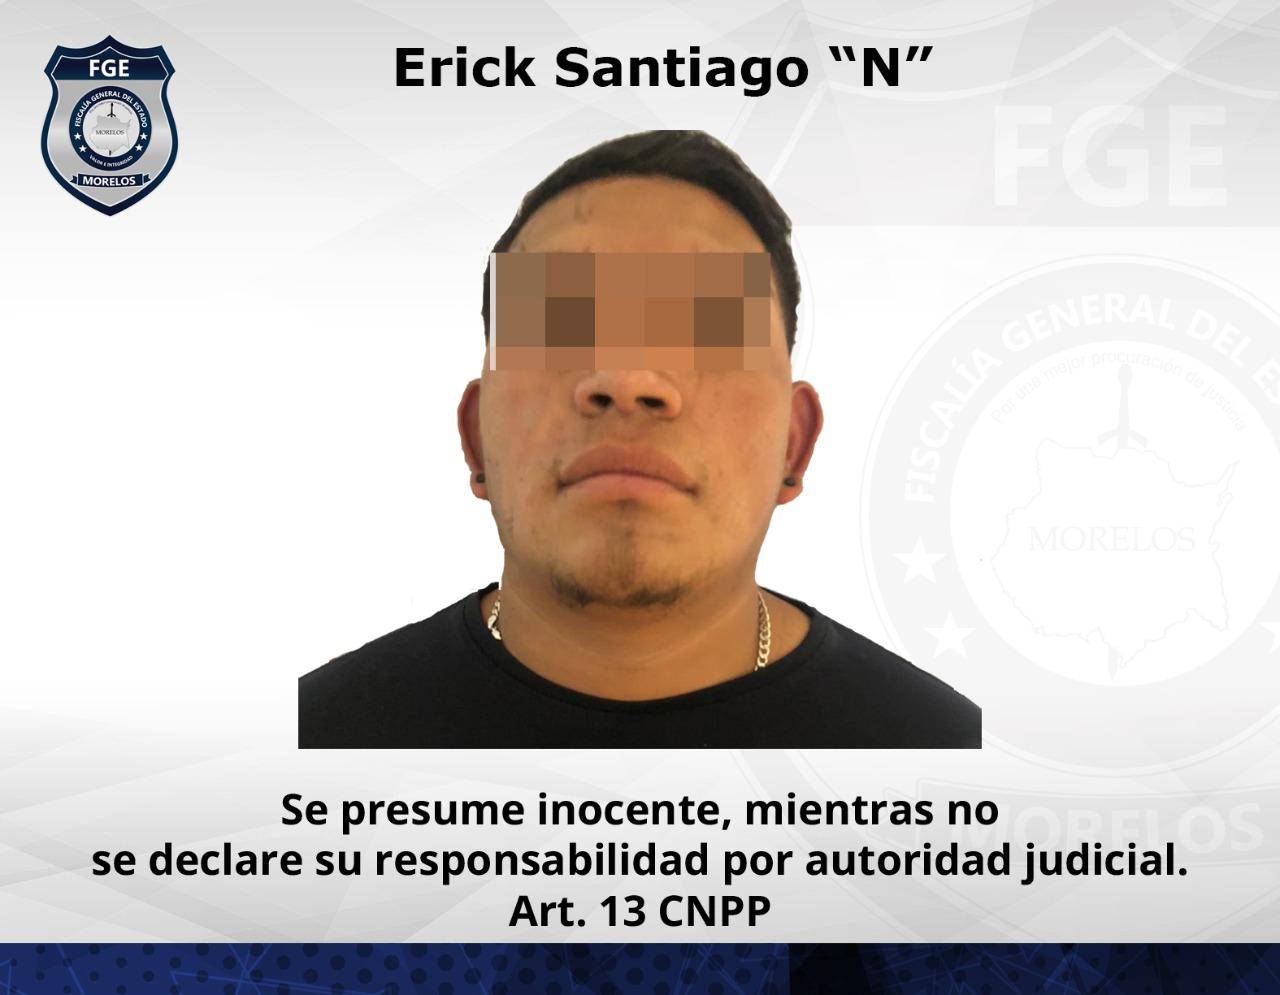 ERICK-SANTIAGO-N